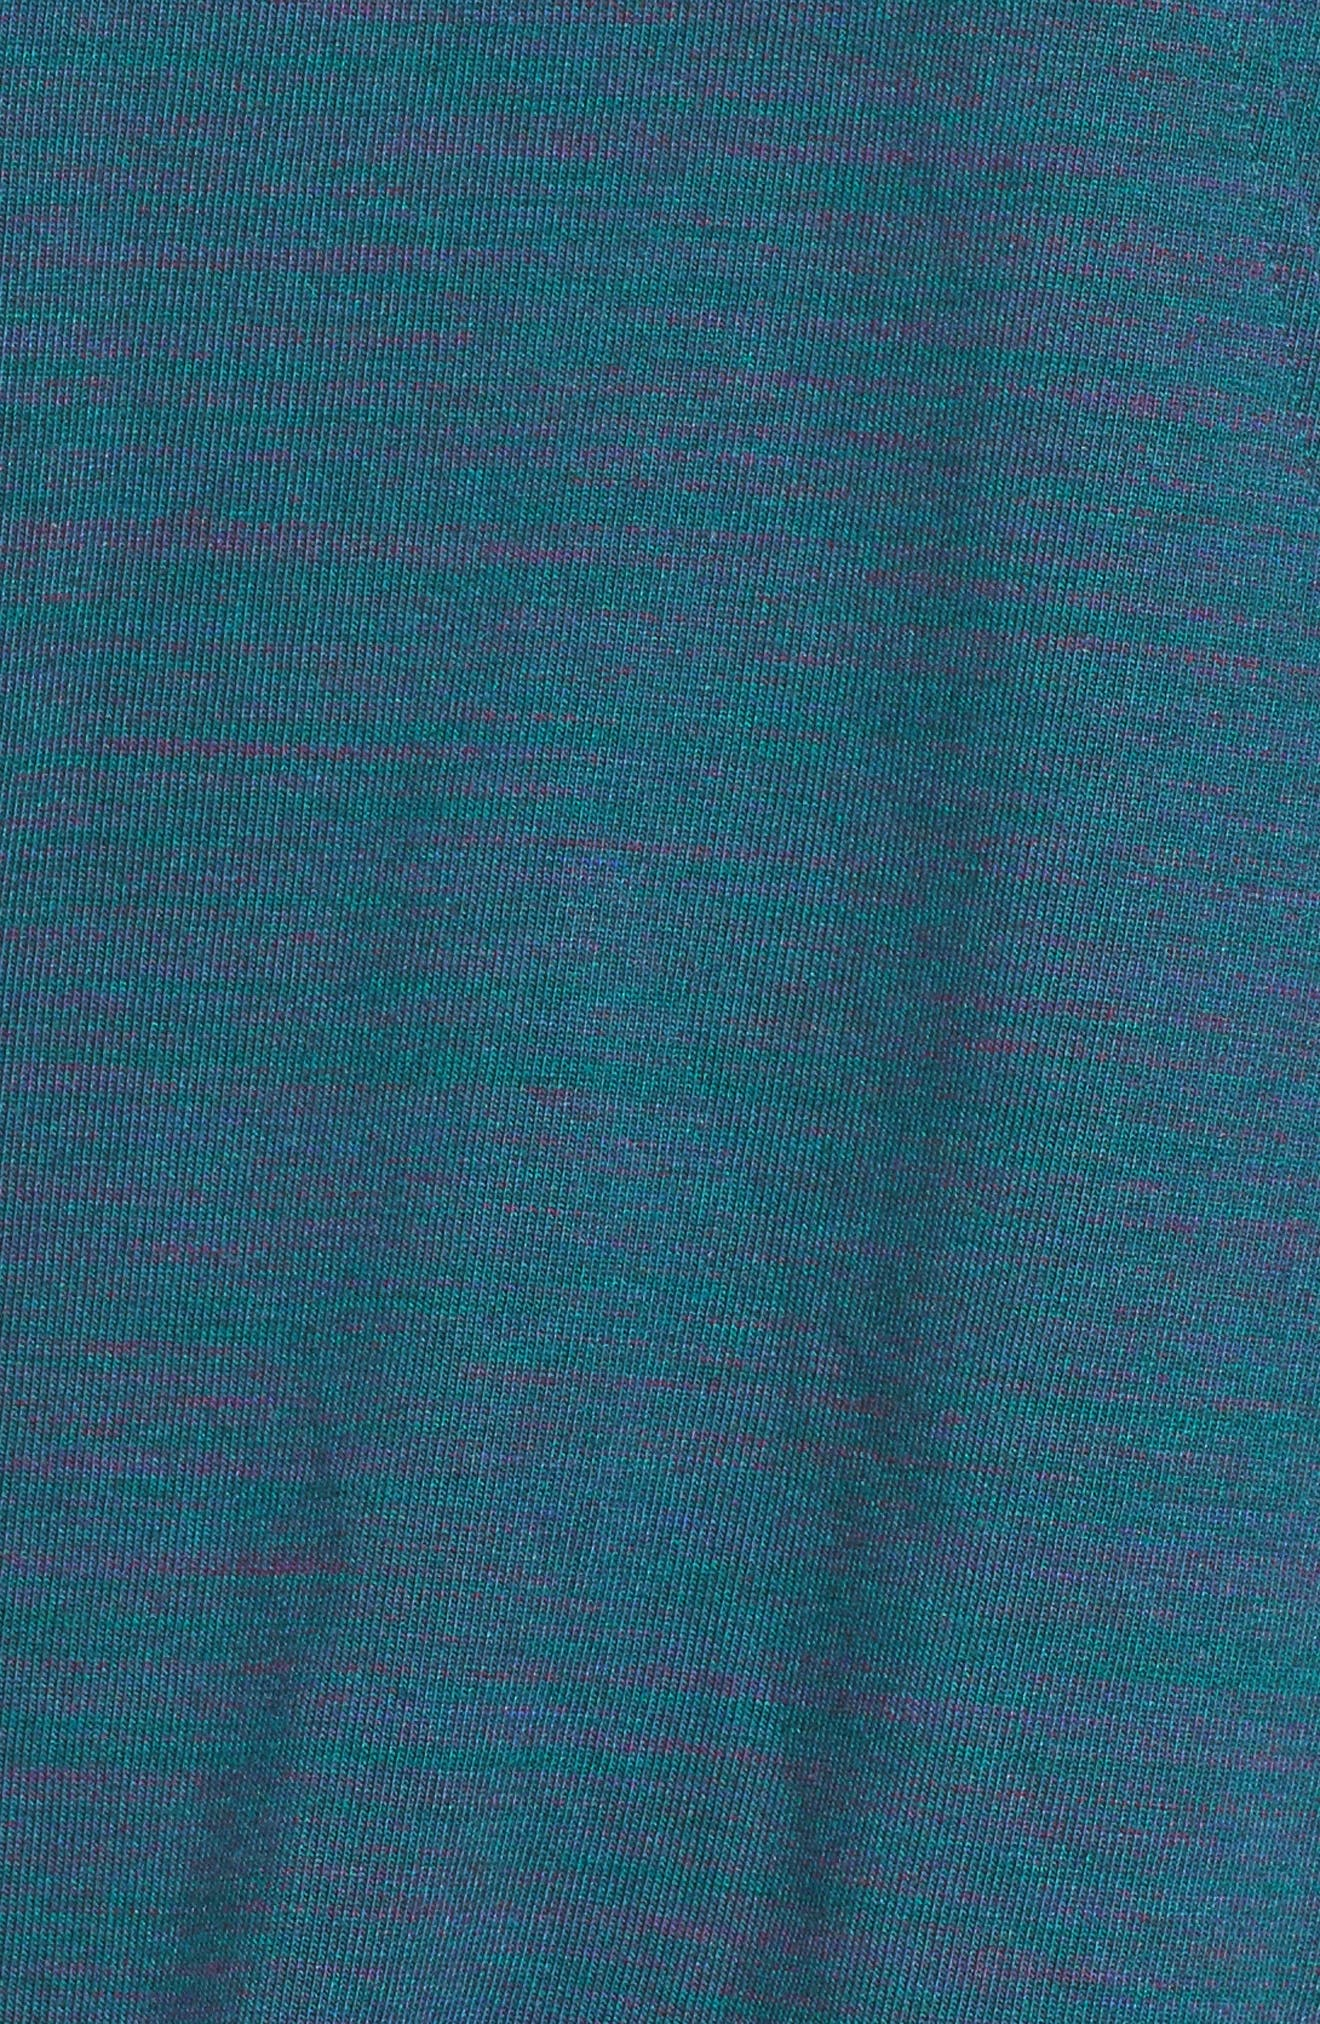 Gym Zip Hoodie,                             Alternate thumbnail 6, color,                             Dk Atomic Teal/ Htr/ Sail